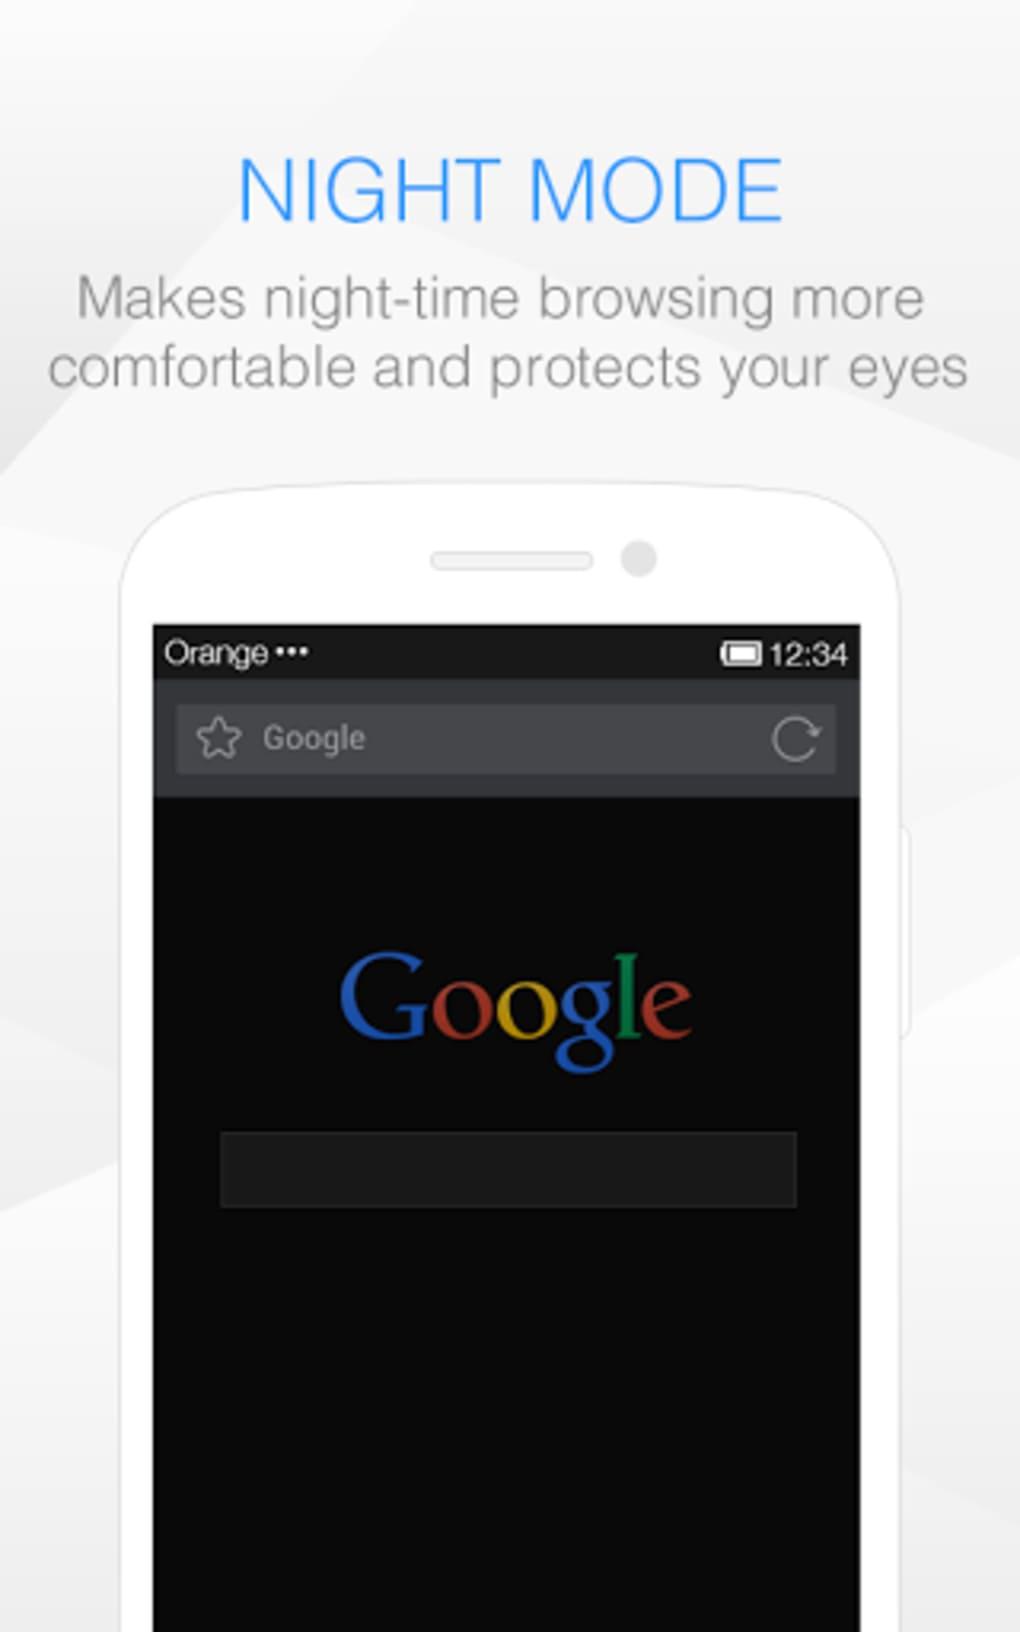 descargar flash player para android 2.2 gratis